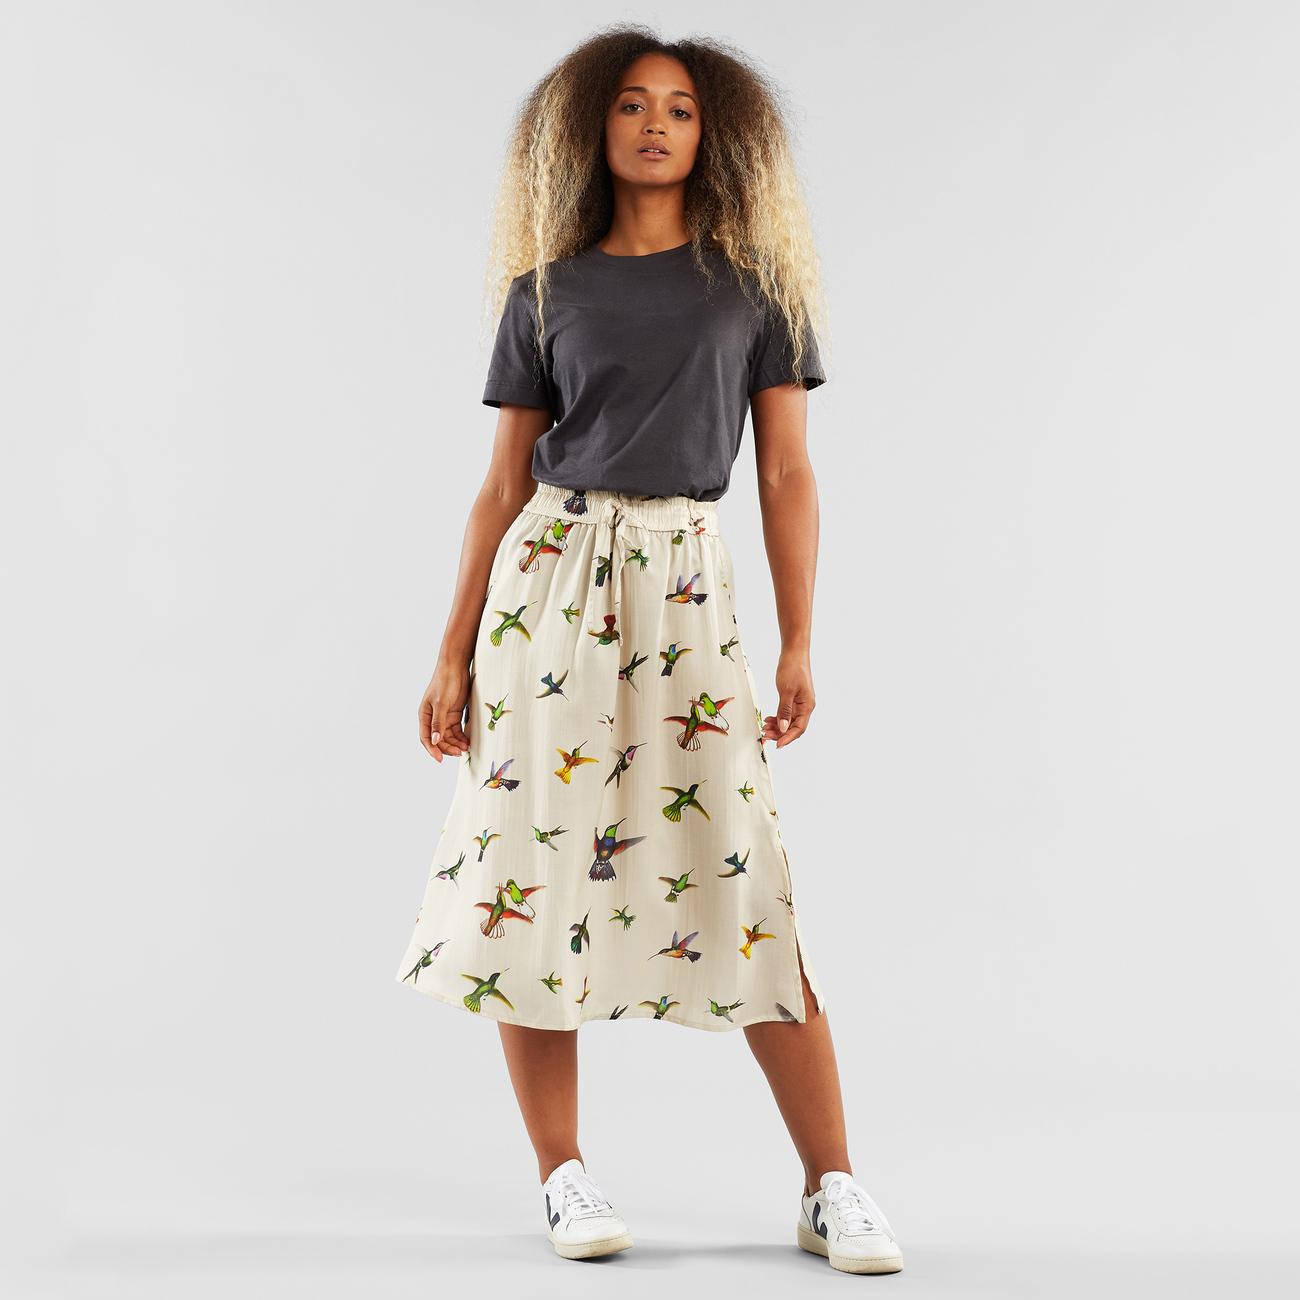 Skirt Klippan Floral Hummingbirds Multi Color